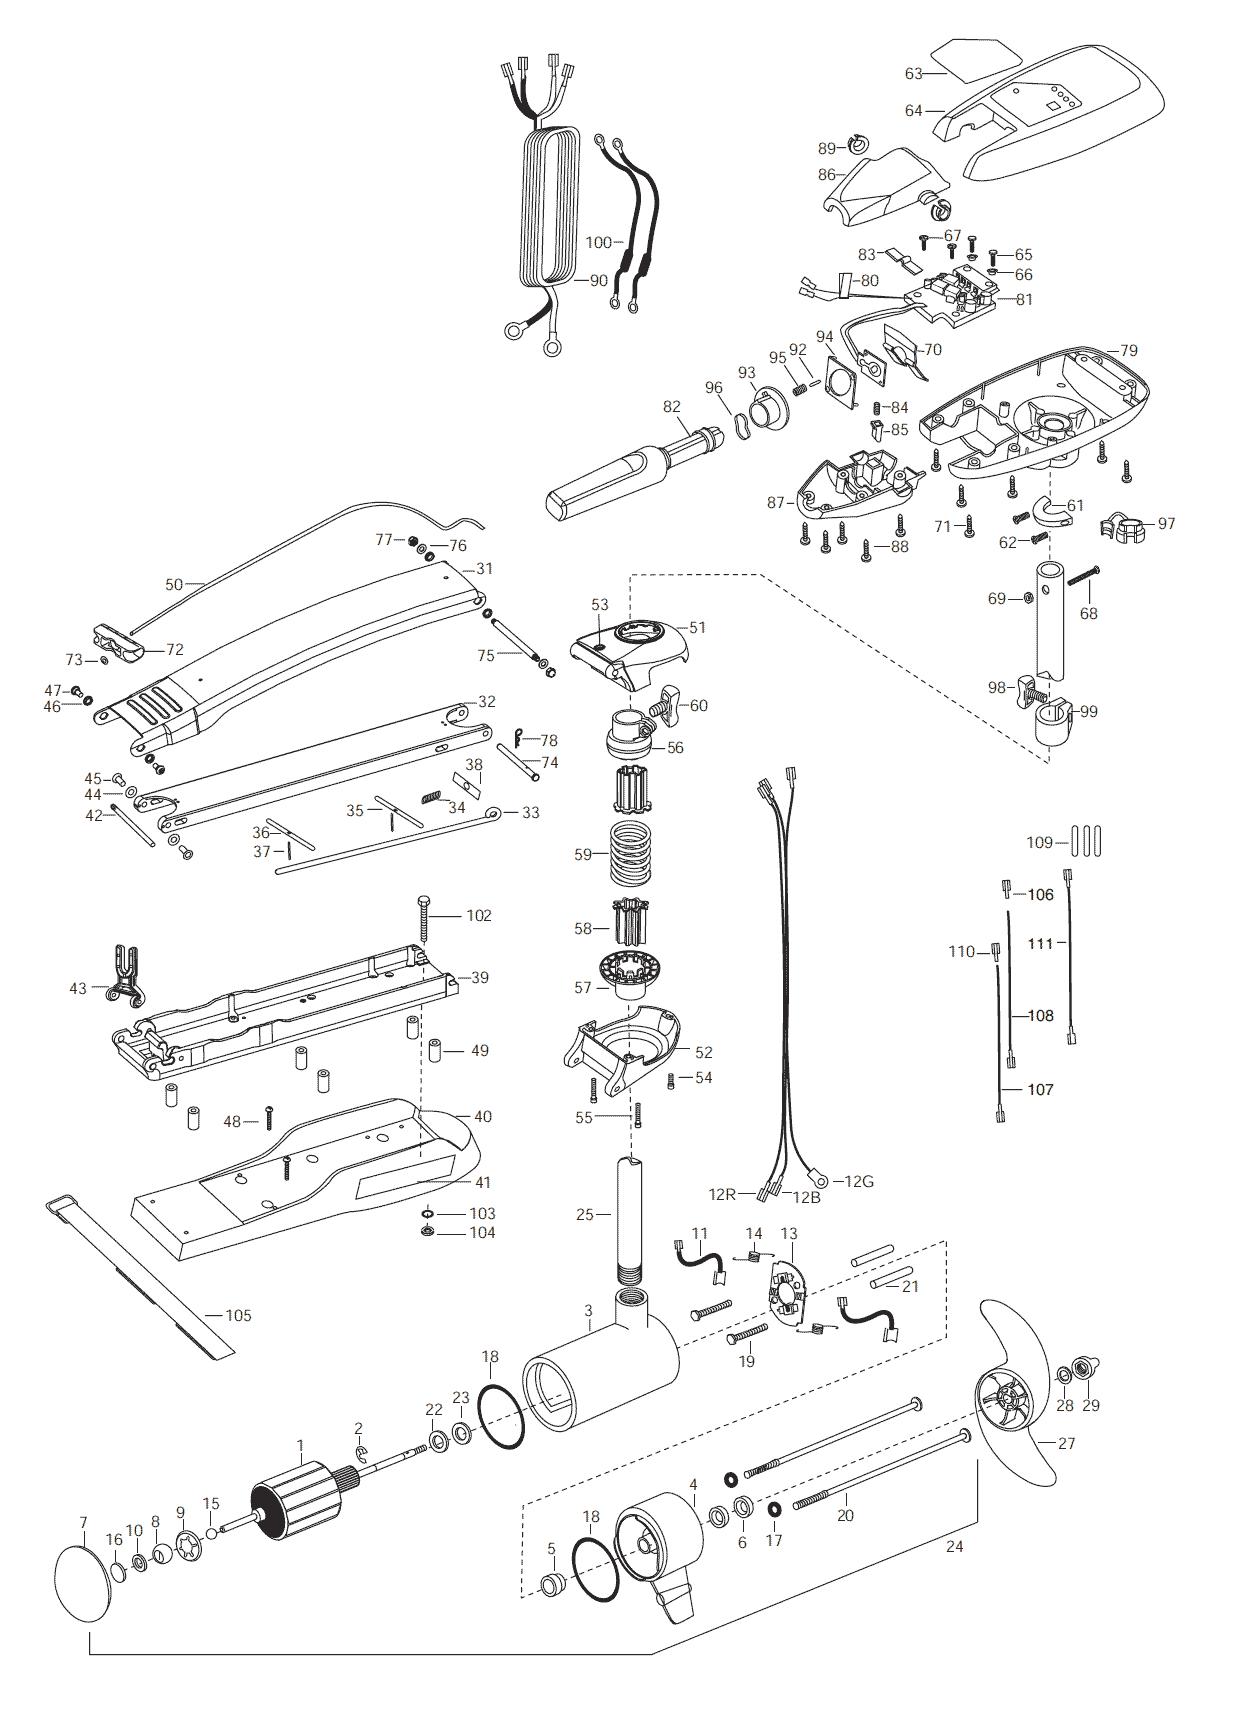 minn kota riptide 55 wiring diagram p90 guitar 101 62 inch parts 2003 from fish307